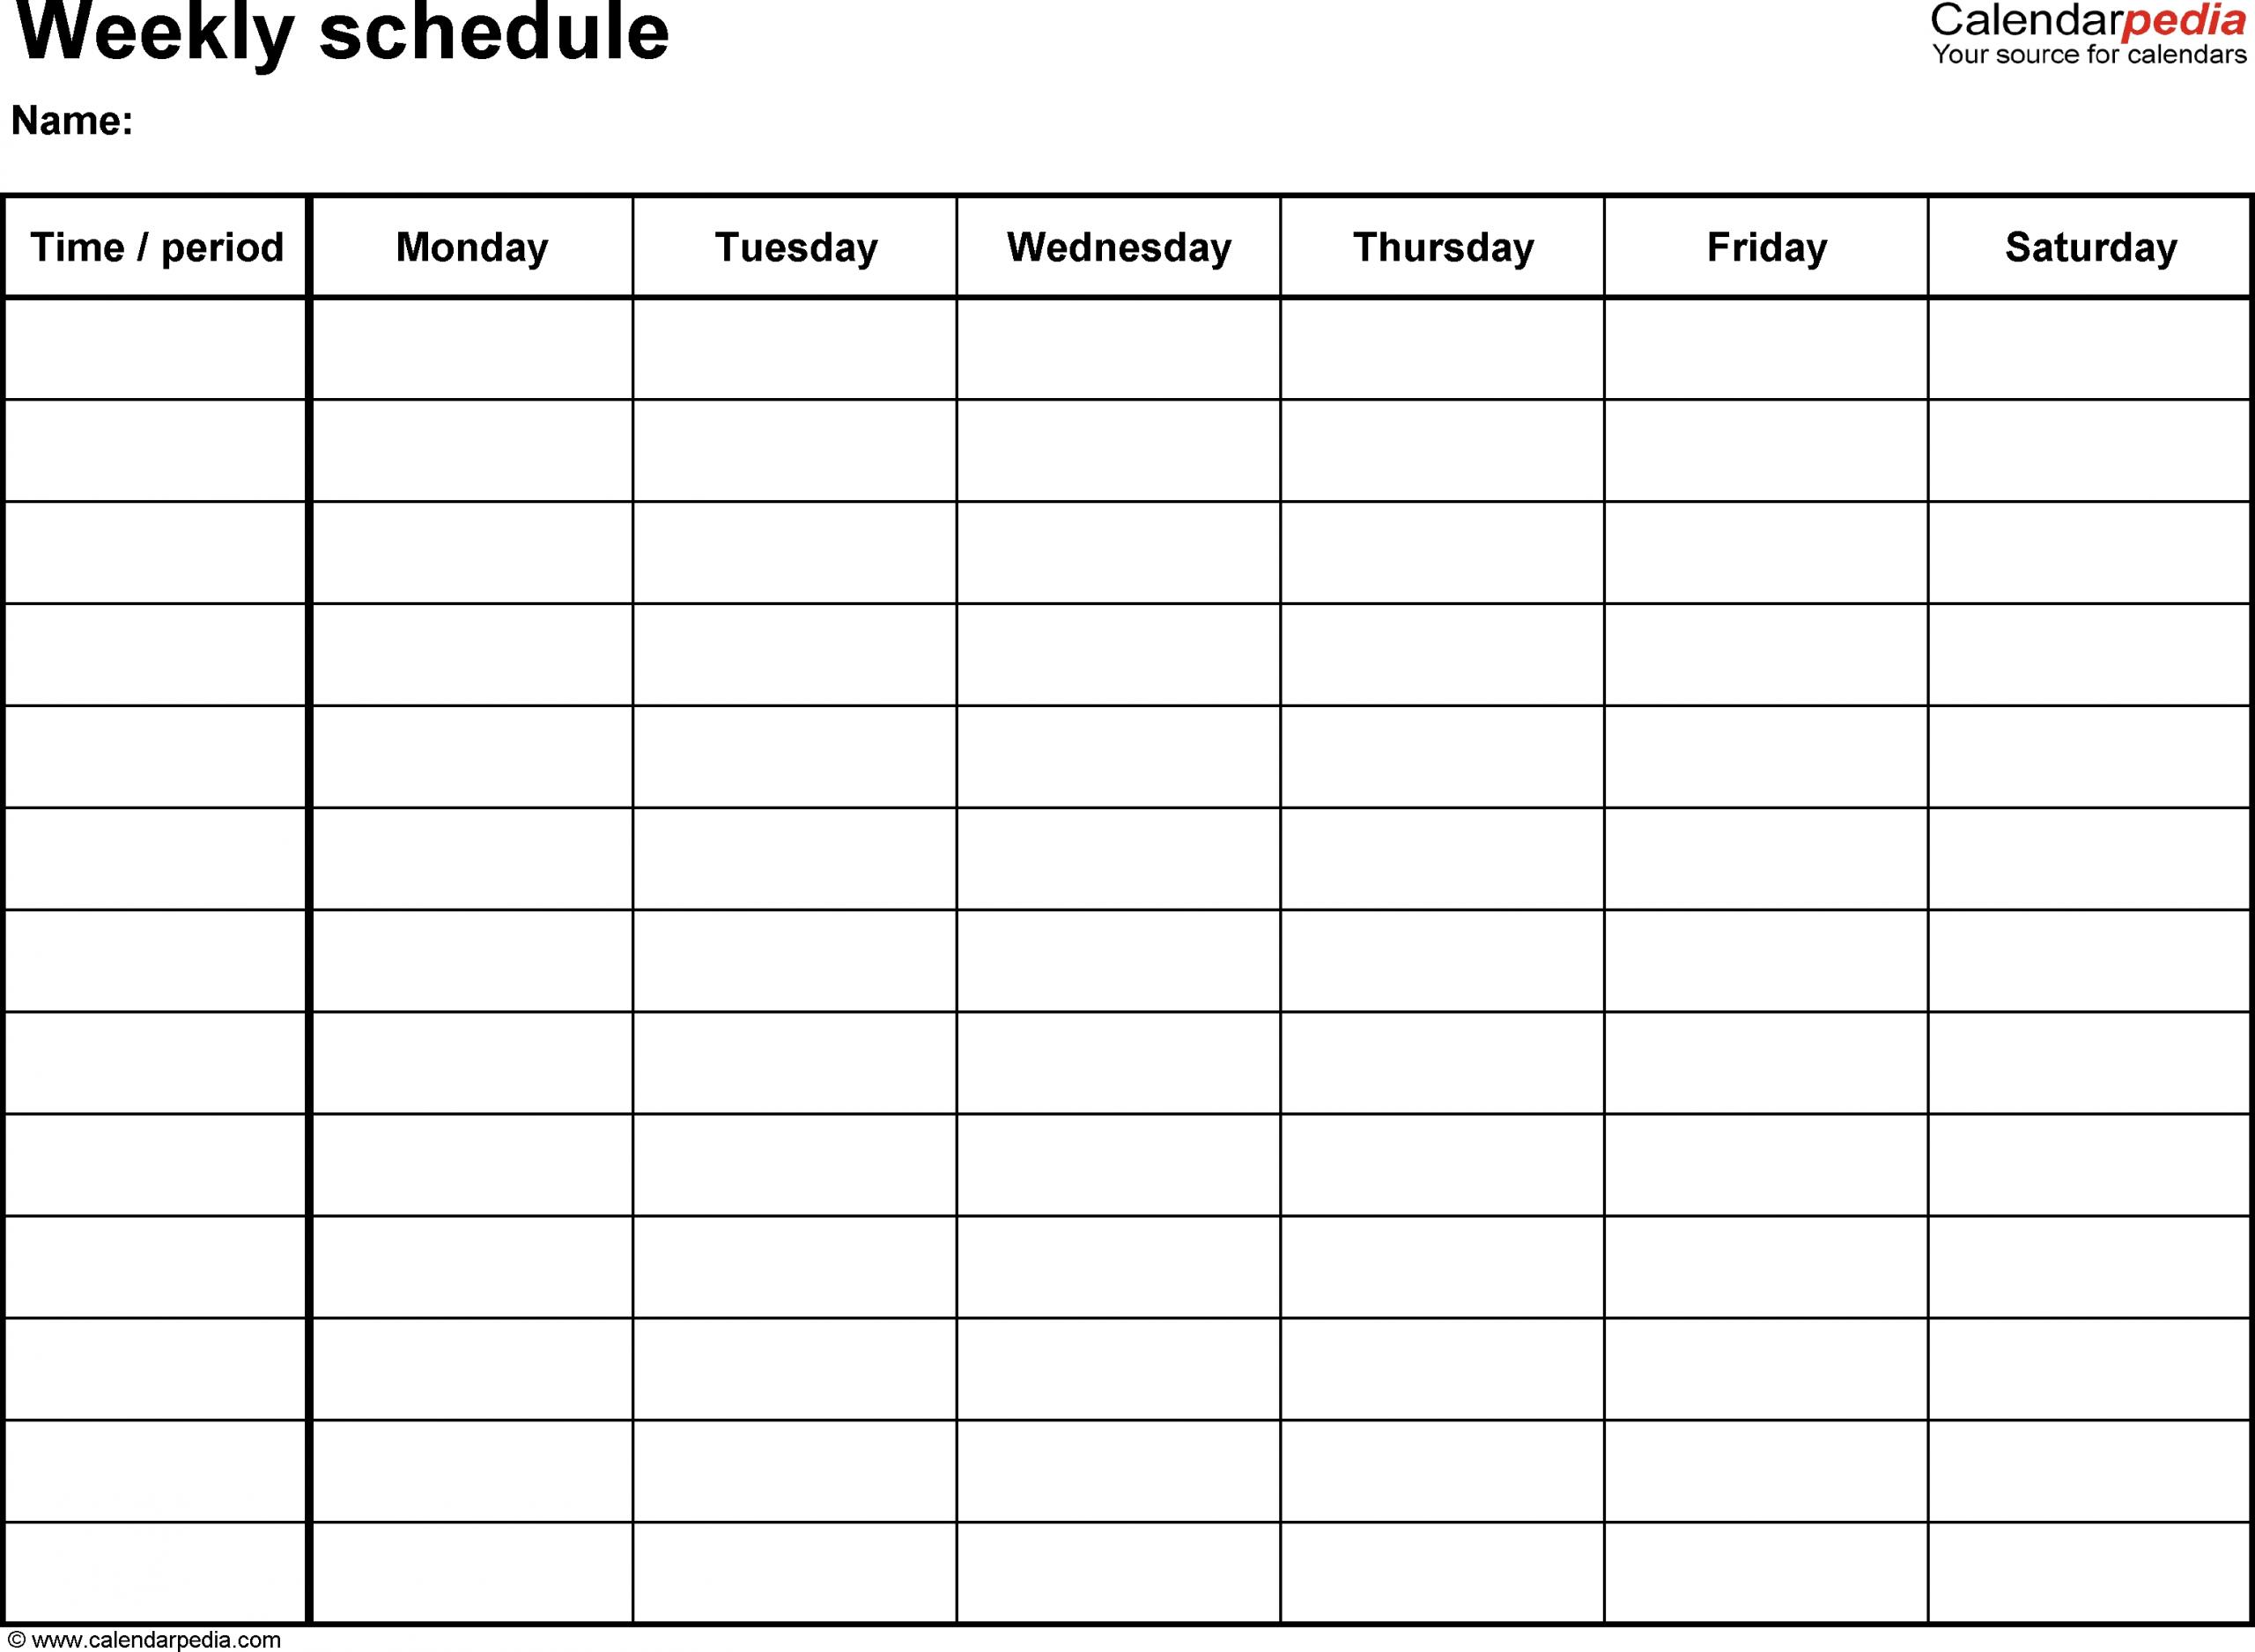 6 Week Blank Calendar Template – Template Calendar Design Depo Provera Calendar Printable Pdf Based On 3 Months